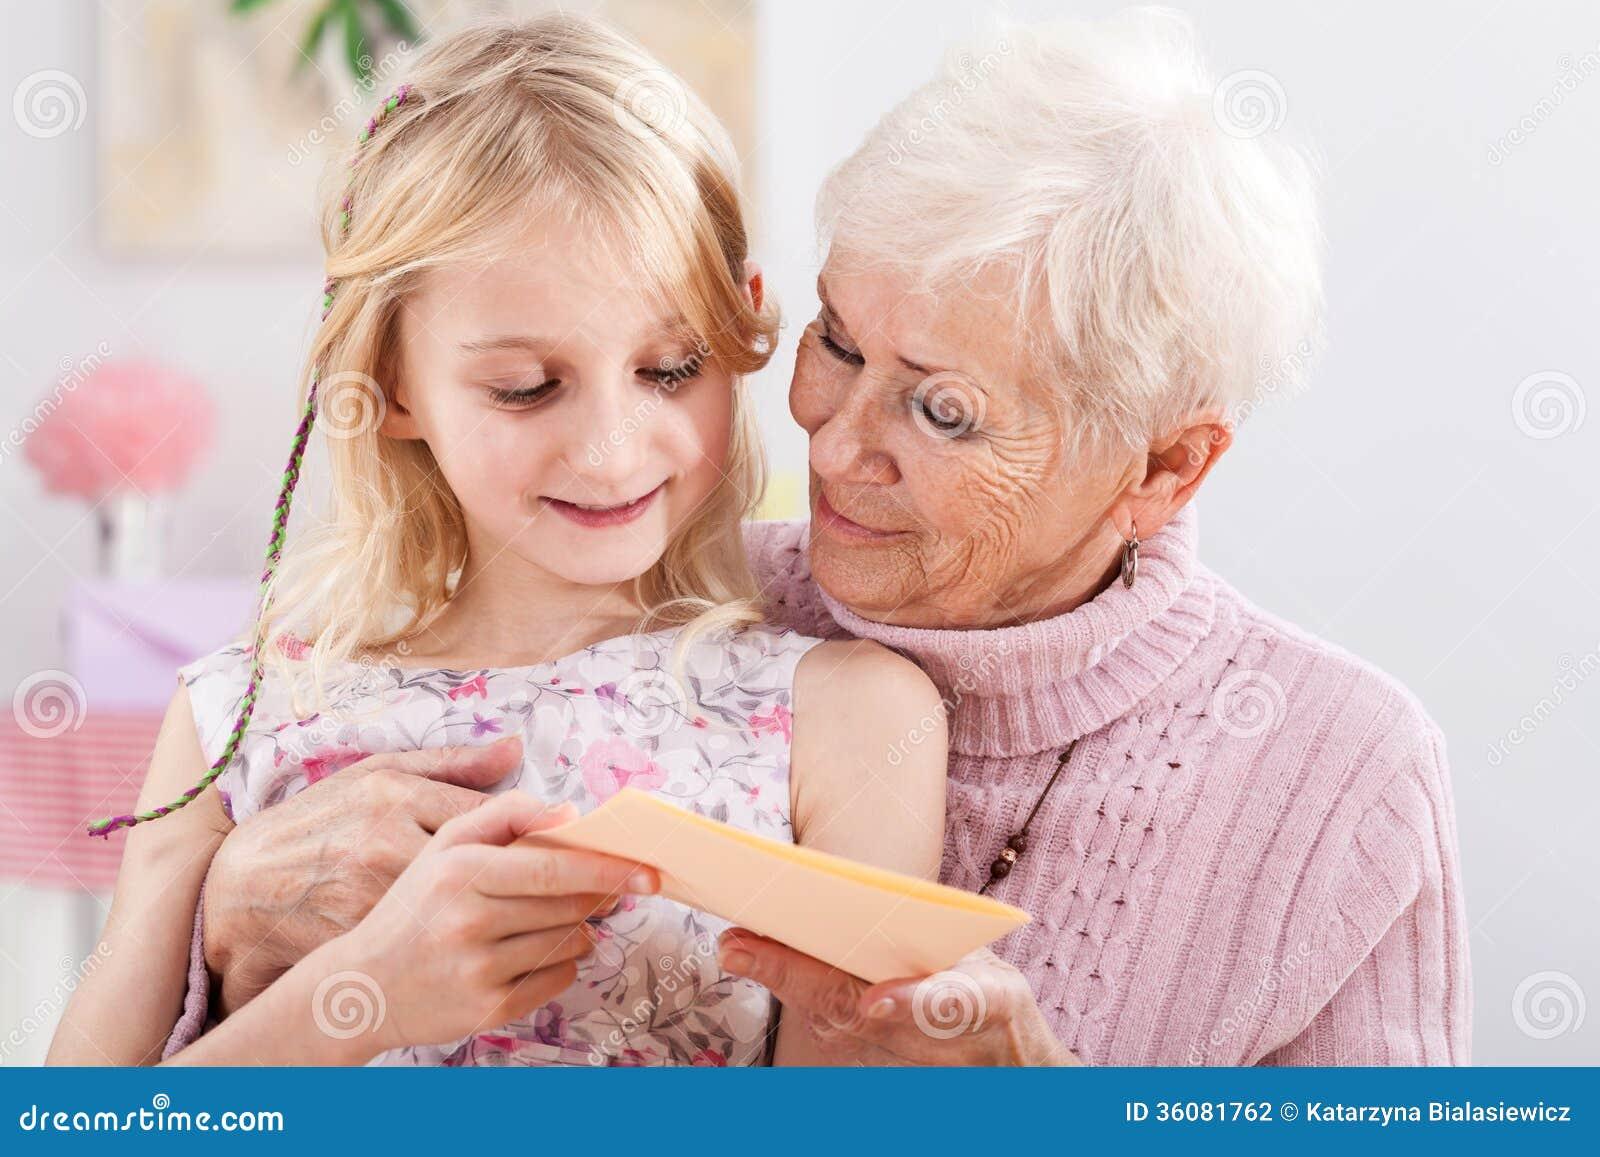 Birthday card for grandma